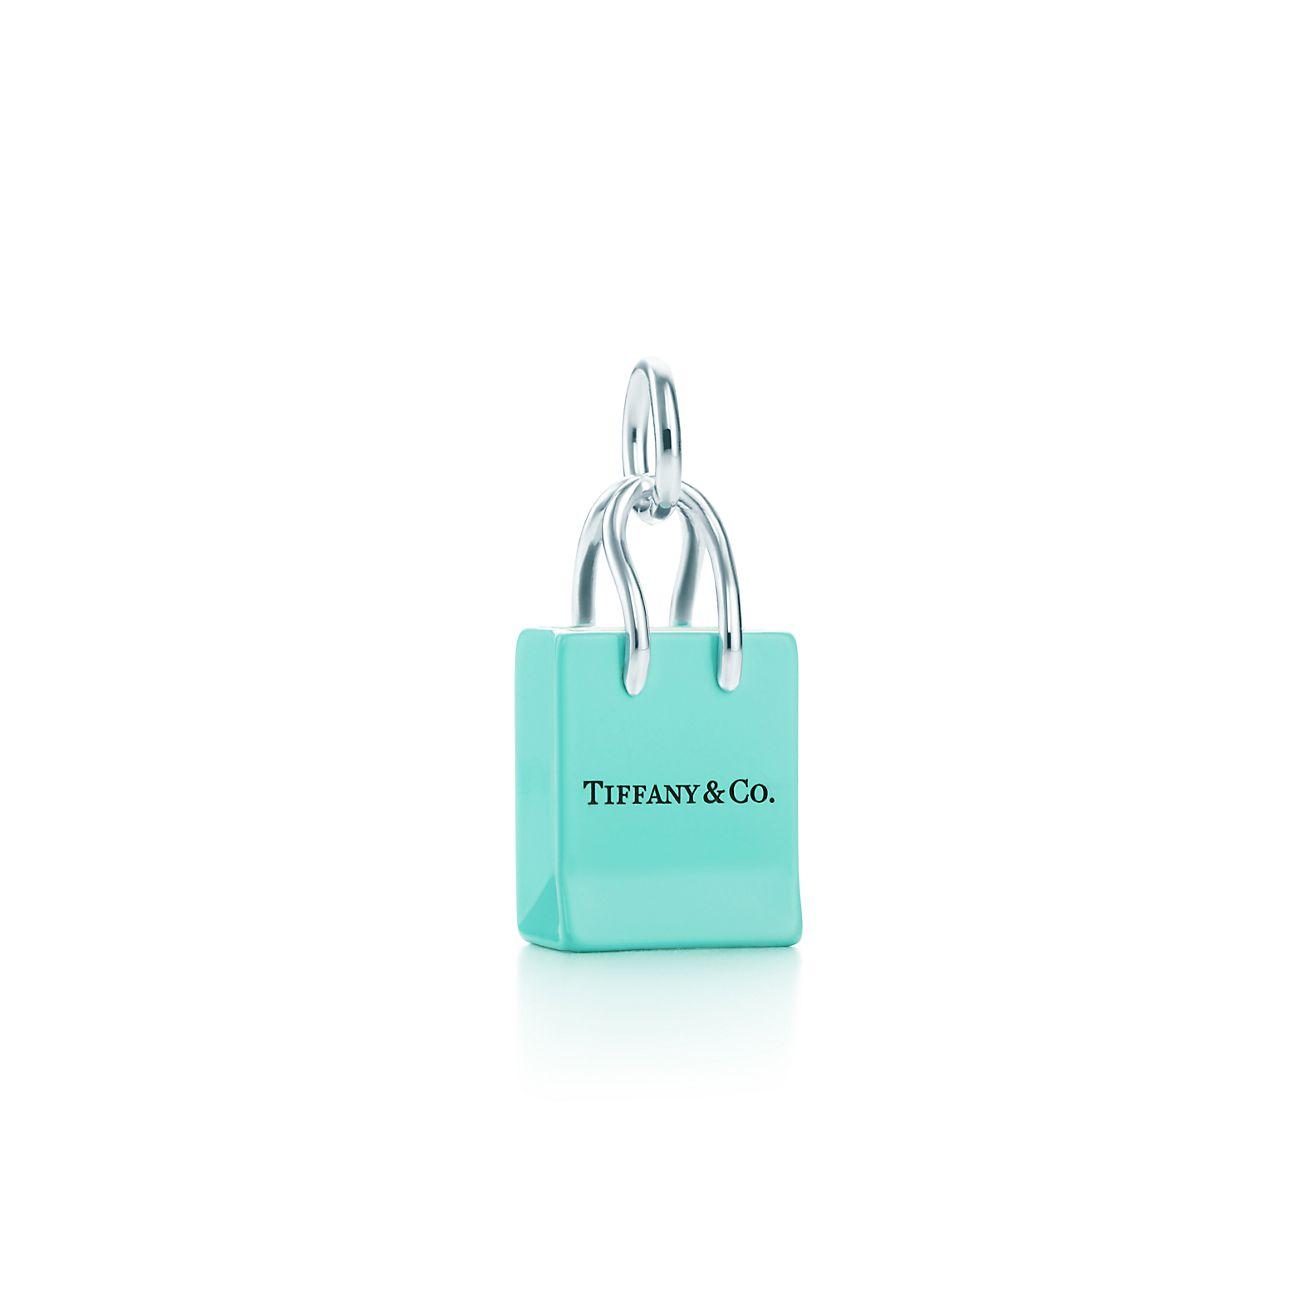 Jewelry Tiffany Charms Tiffany Co Shopping Bag Charm 25161211 Cheap Tiffany Charms